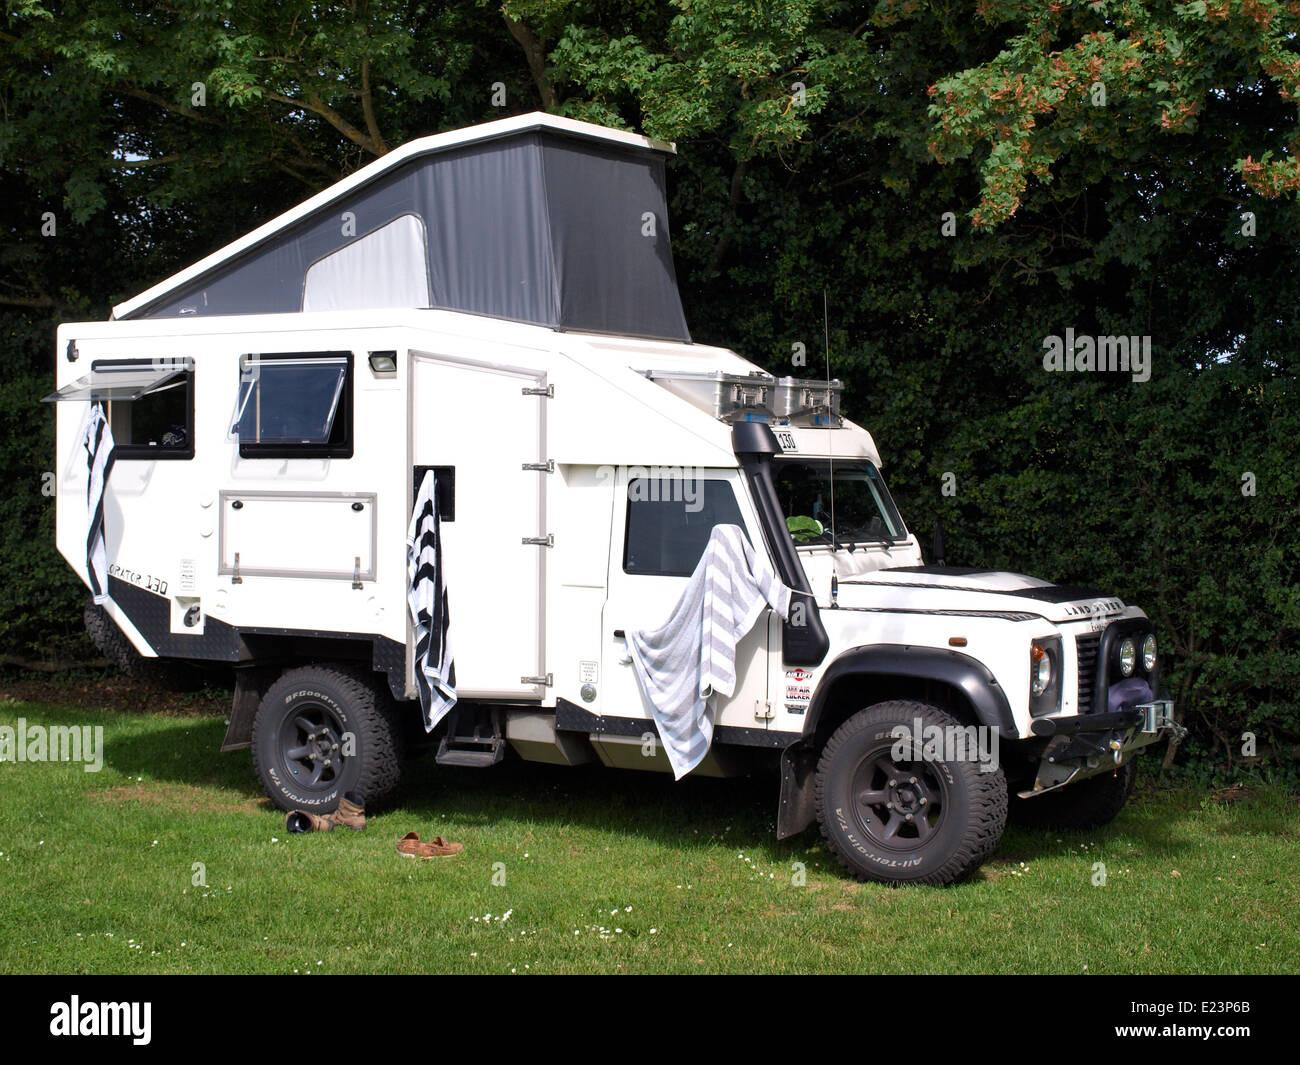 Jeep Sahara Roof Rack Land-Rover expedition vehicle Stockfoto, Lizenzfreies Bild ...